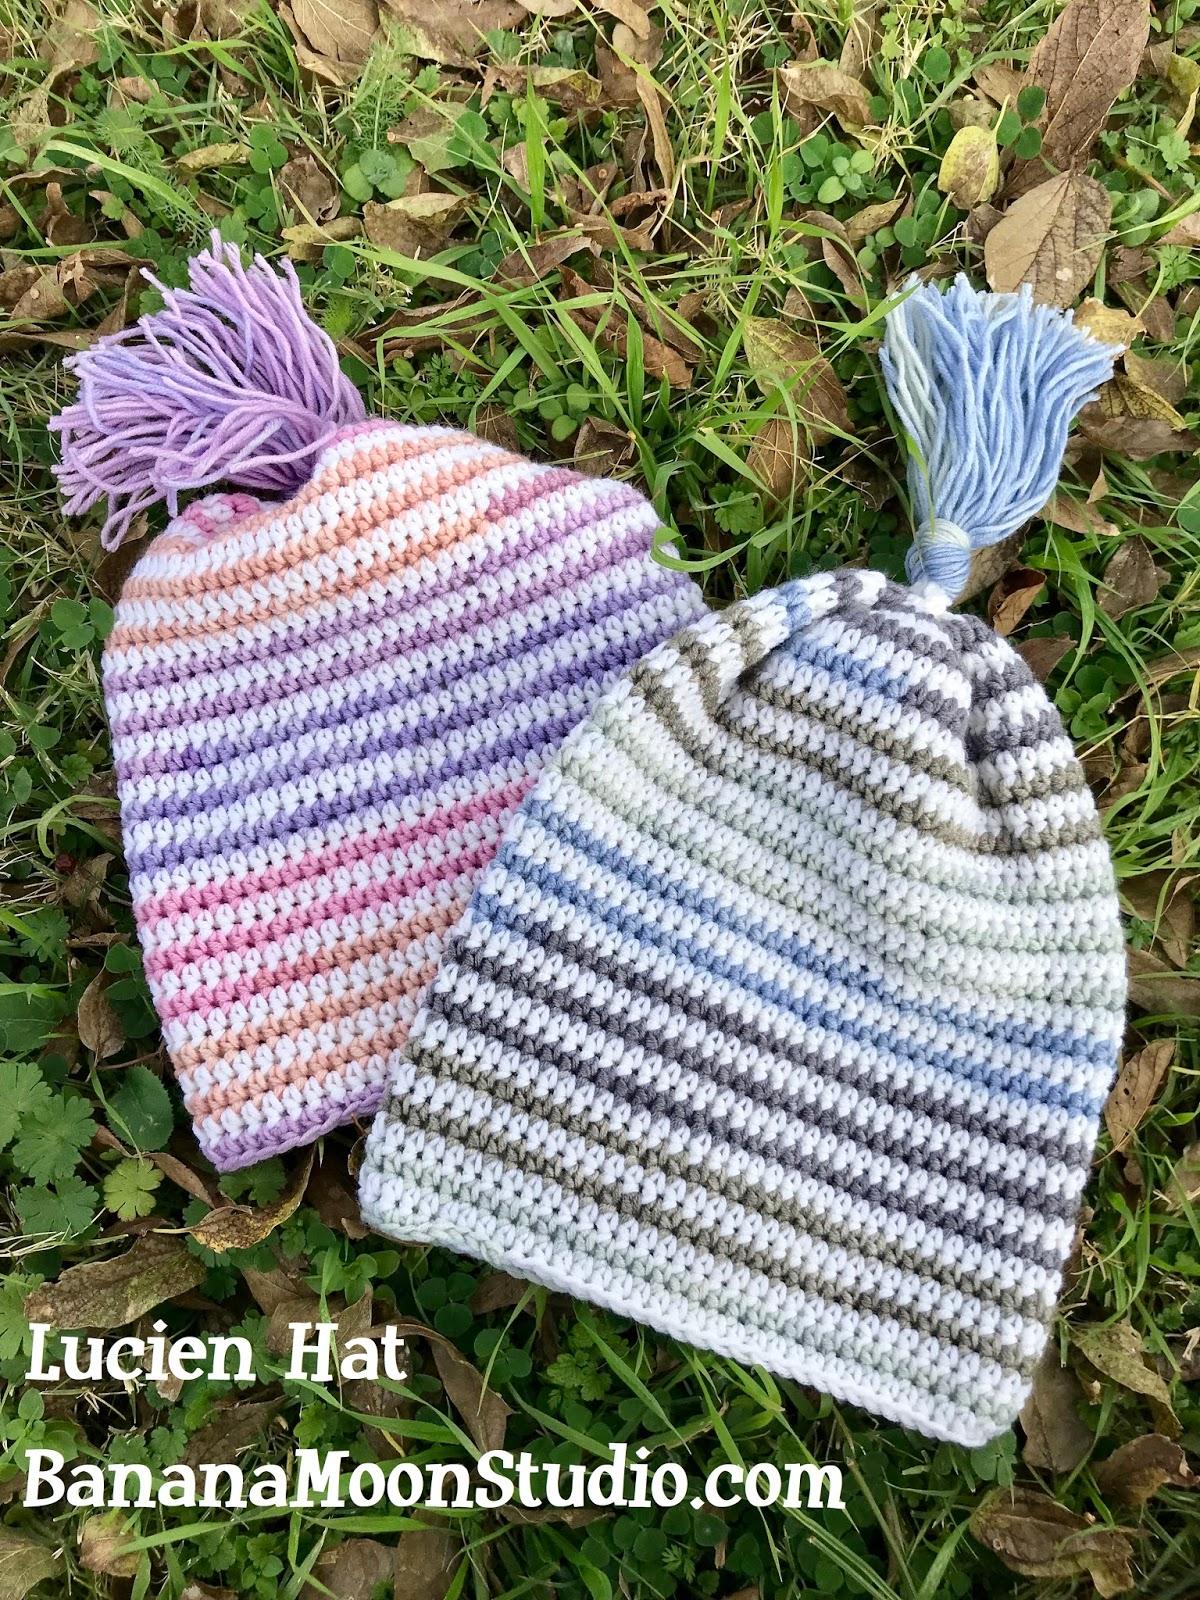 Banana Moon Studio Slouchy Hat Crochet Pattern Lucien Hat